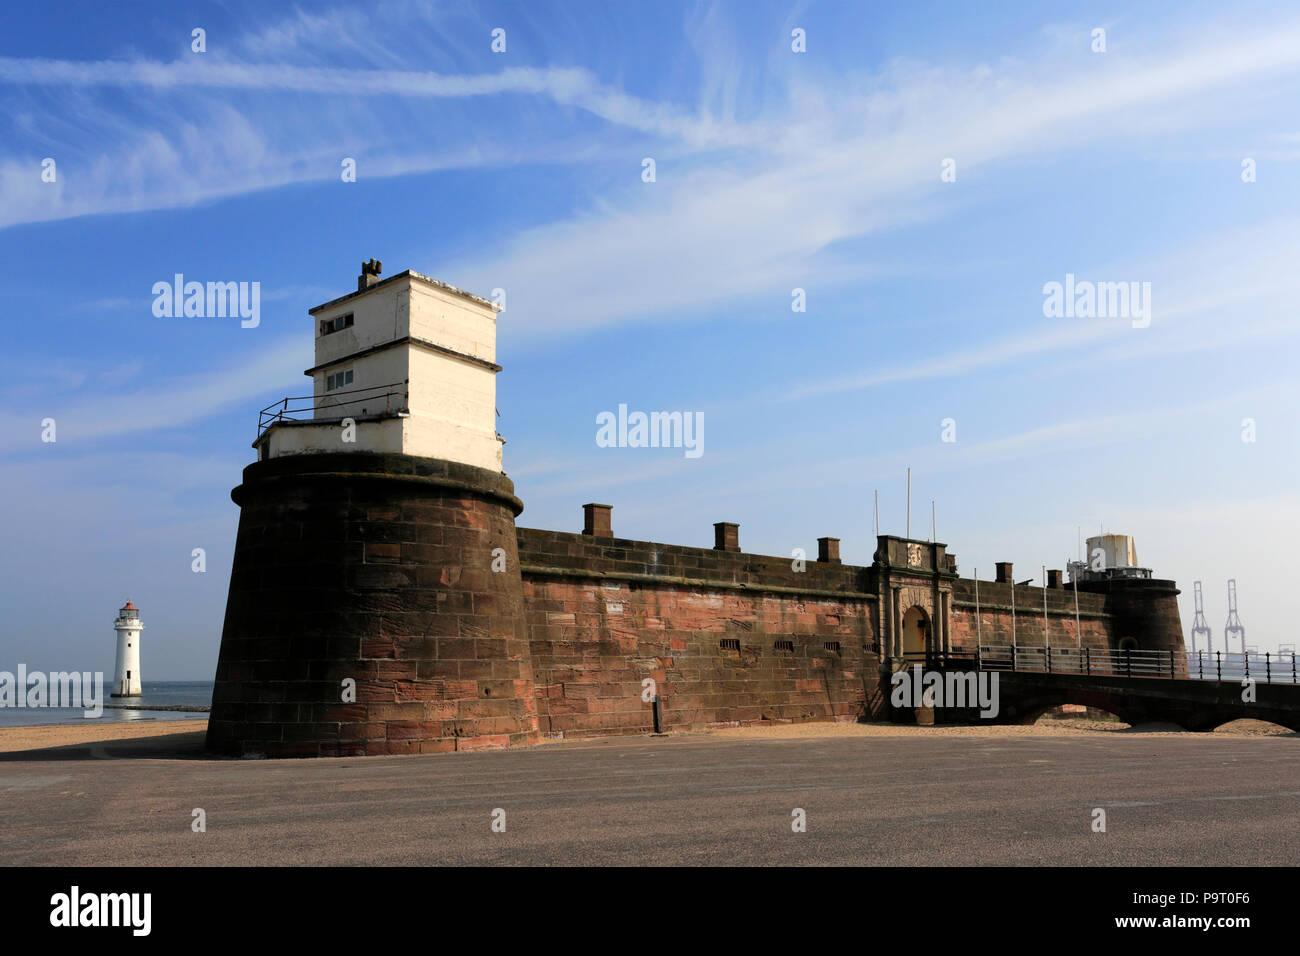 Fort Perch, New Brighton seaside resort, Wallasey town, Wirral, Merseyside, England, UK - Stock Image